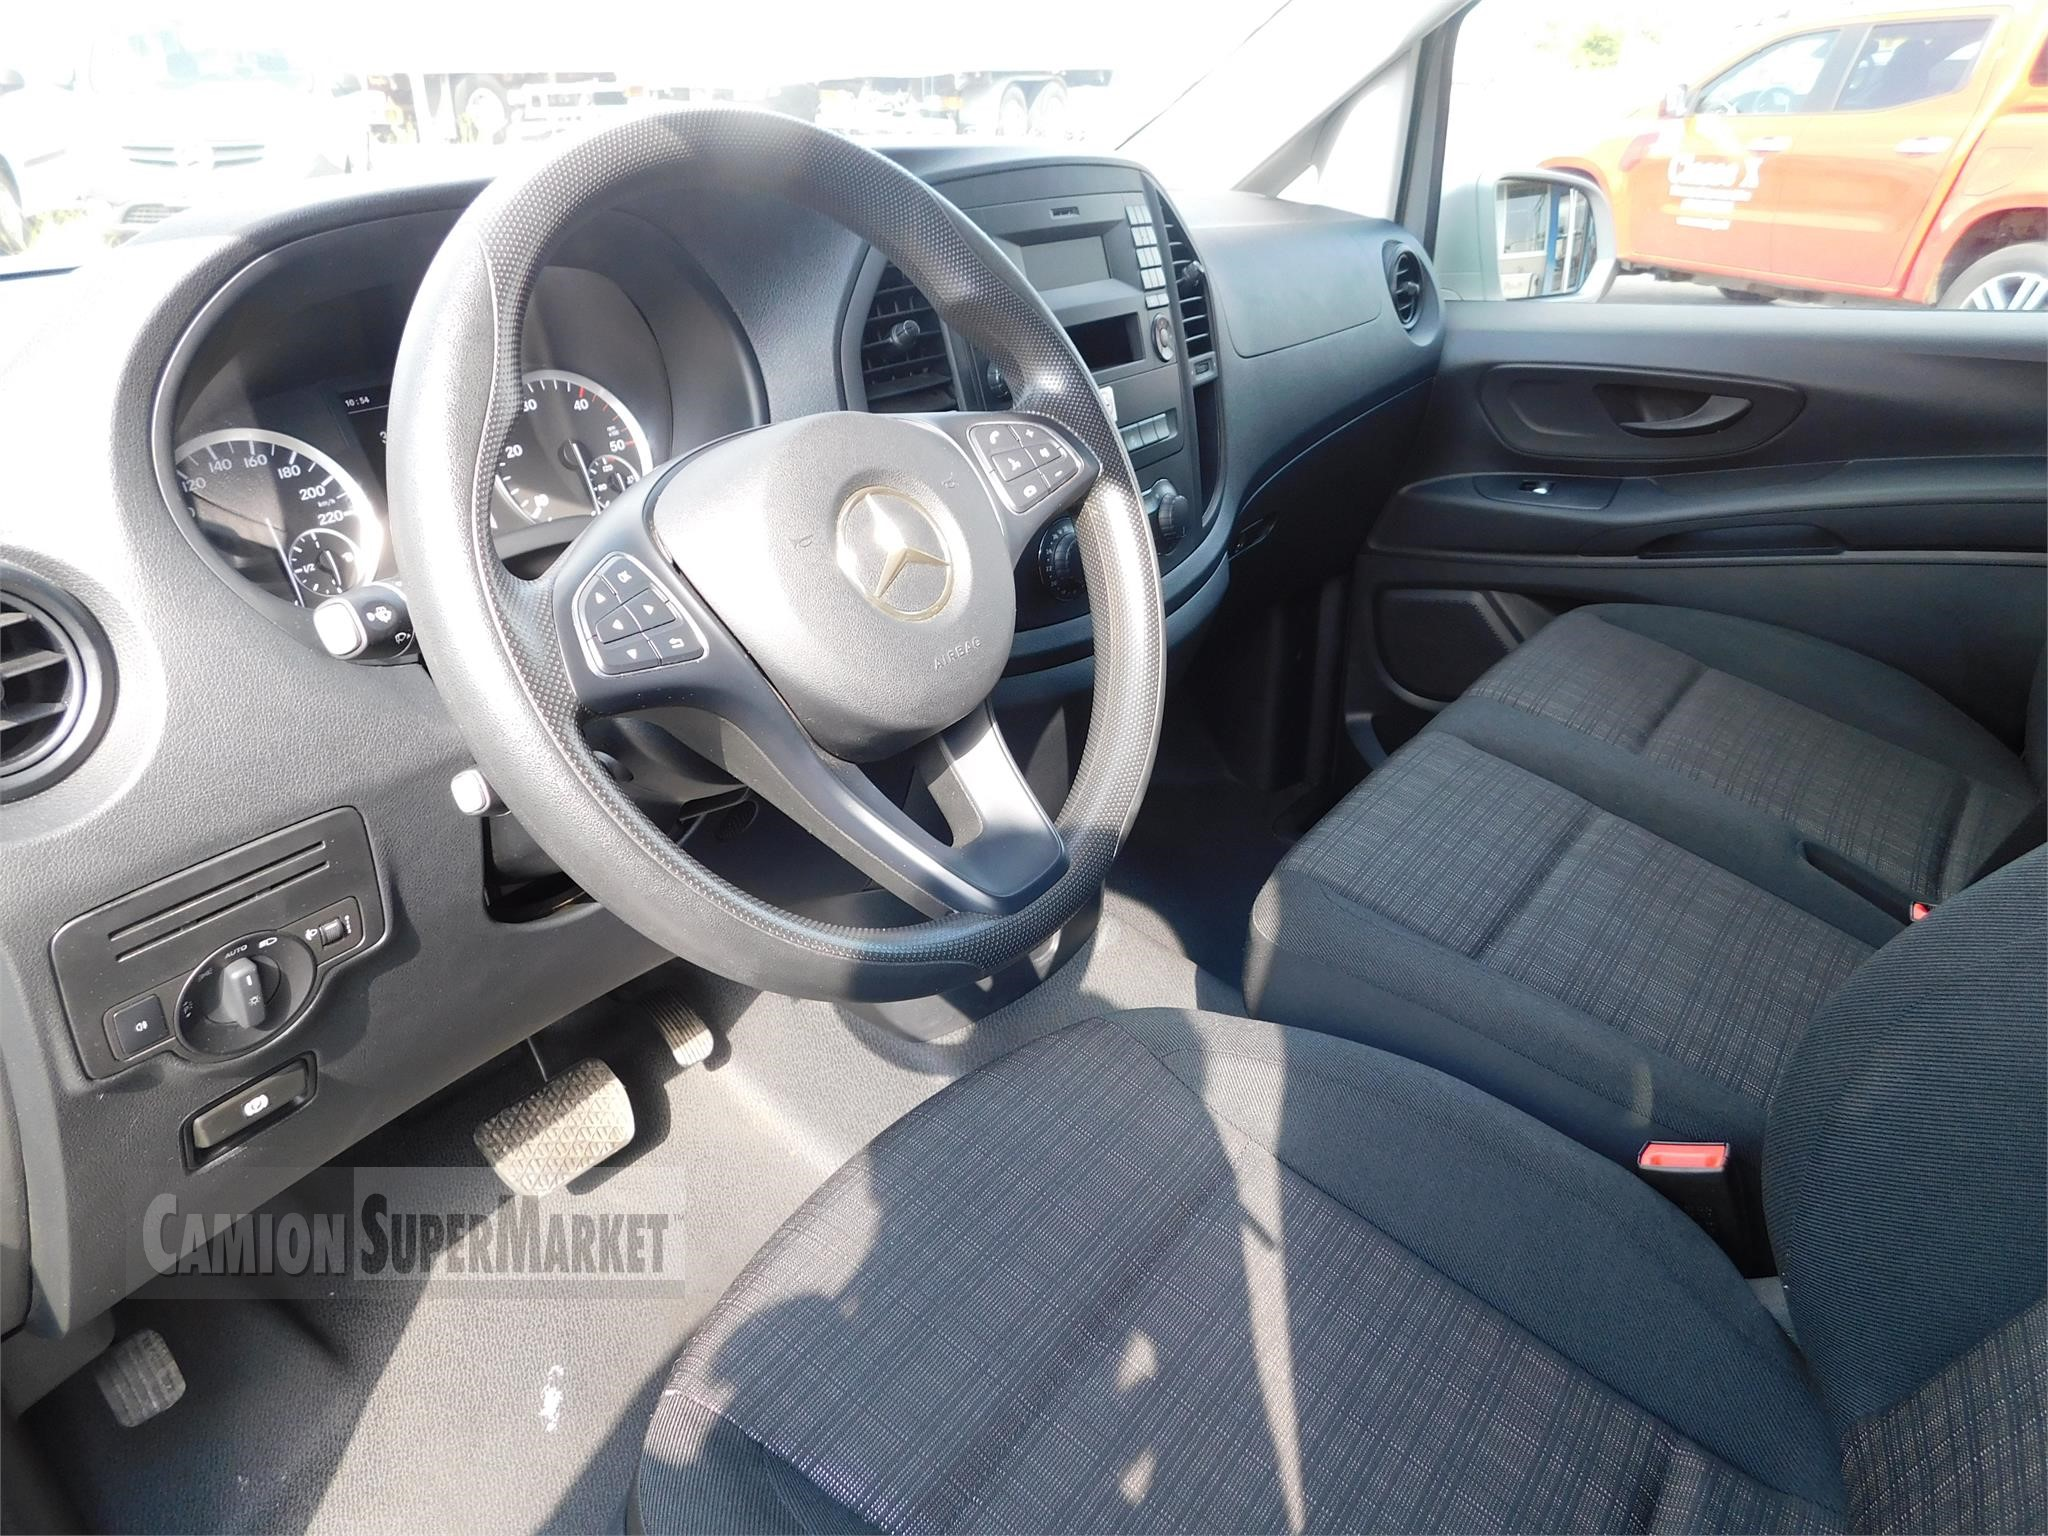 Mercedes-Benz VITO 114 Uzywany 2015 Umbria